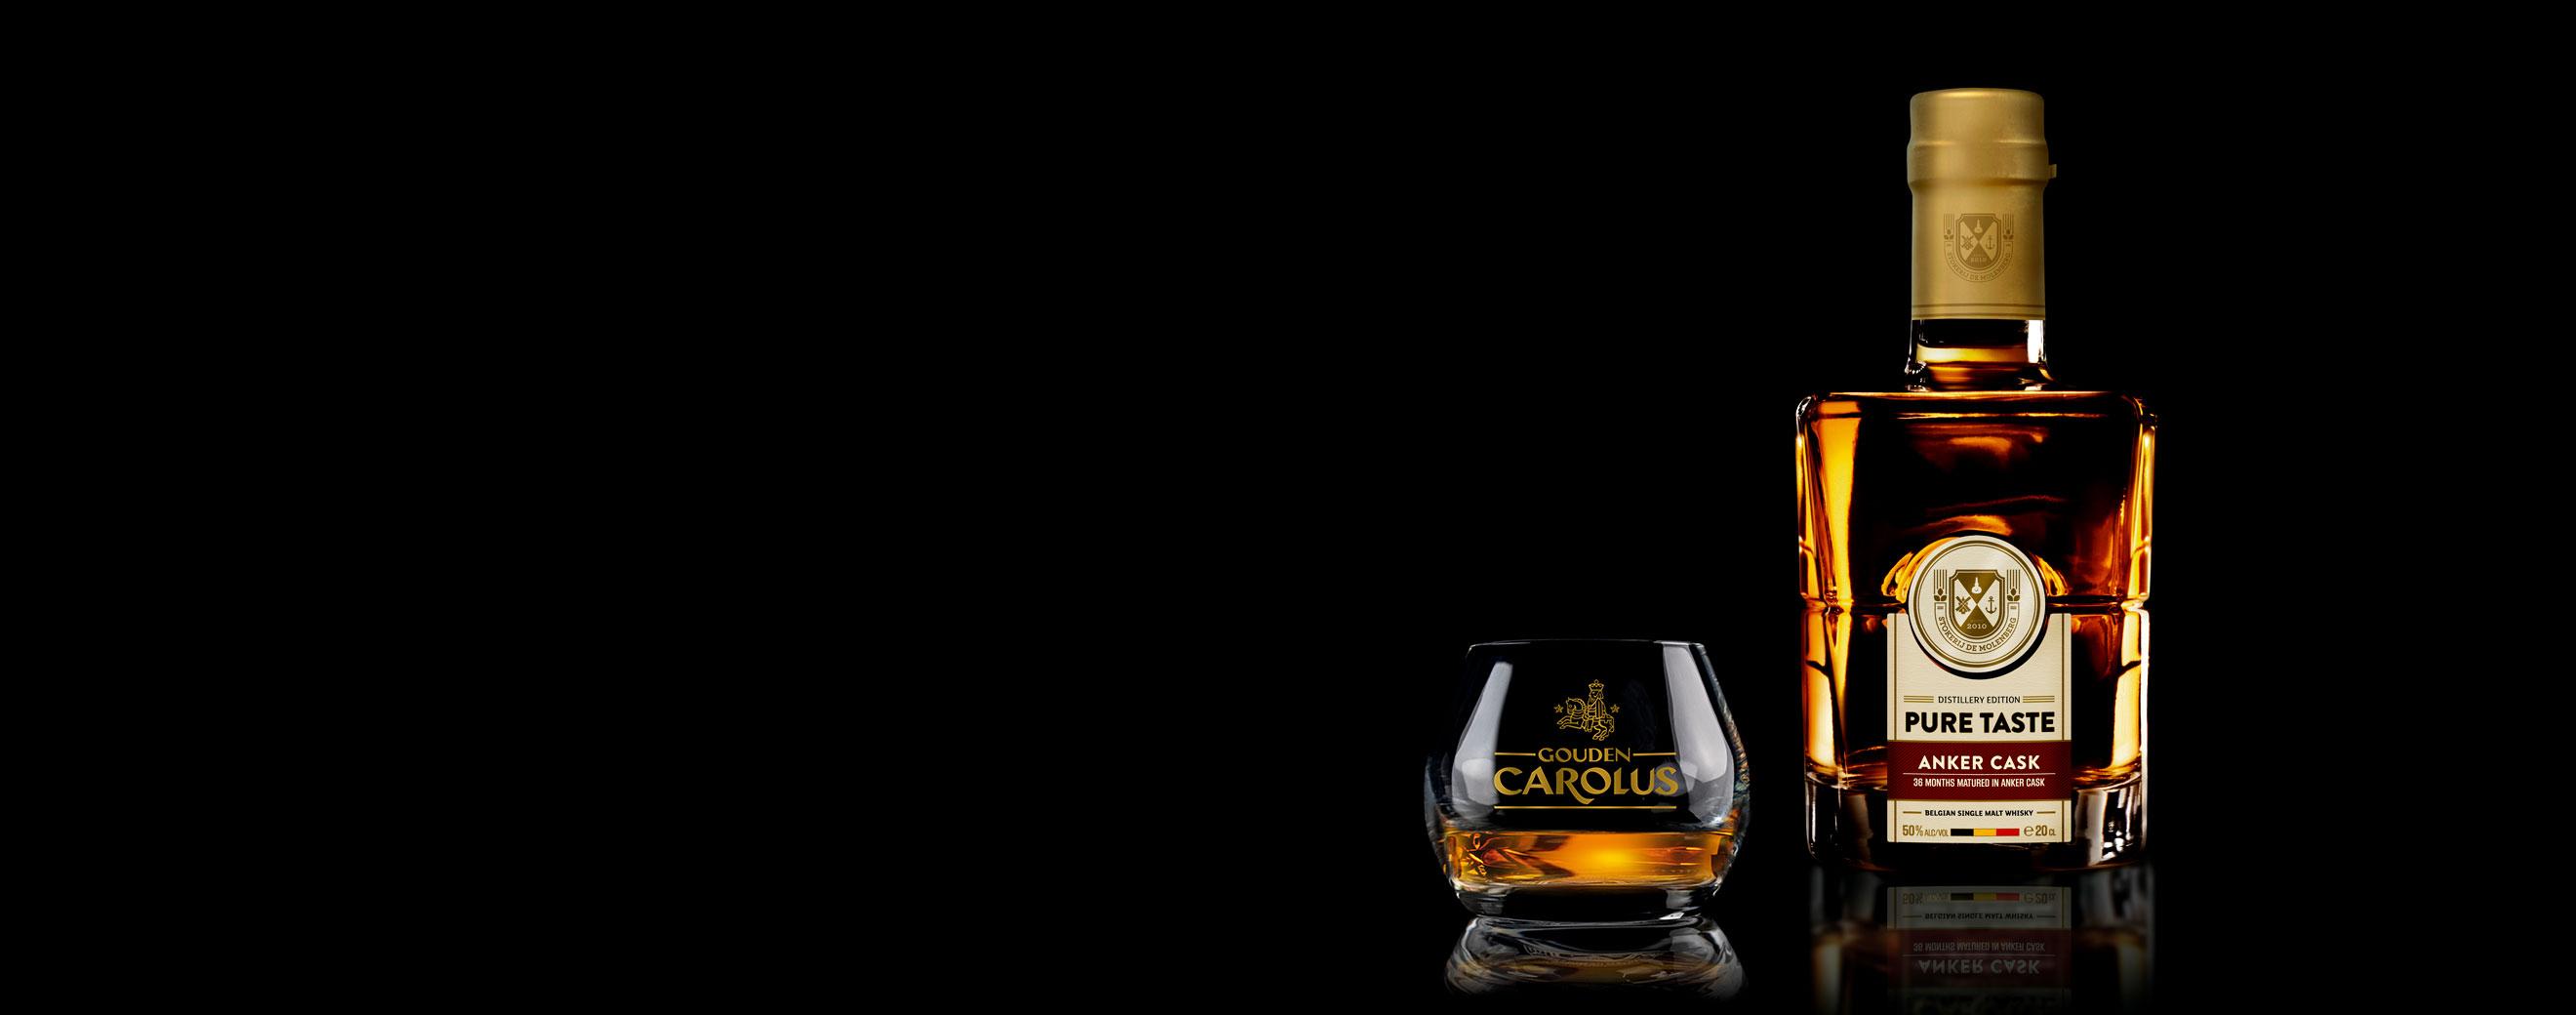 Pure Taste - Anker Cask Whisky Stokerij De Molenberg met glas